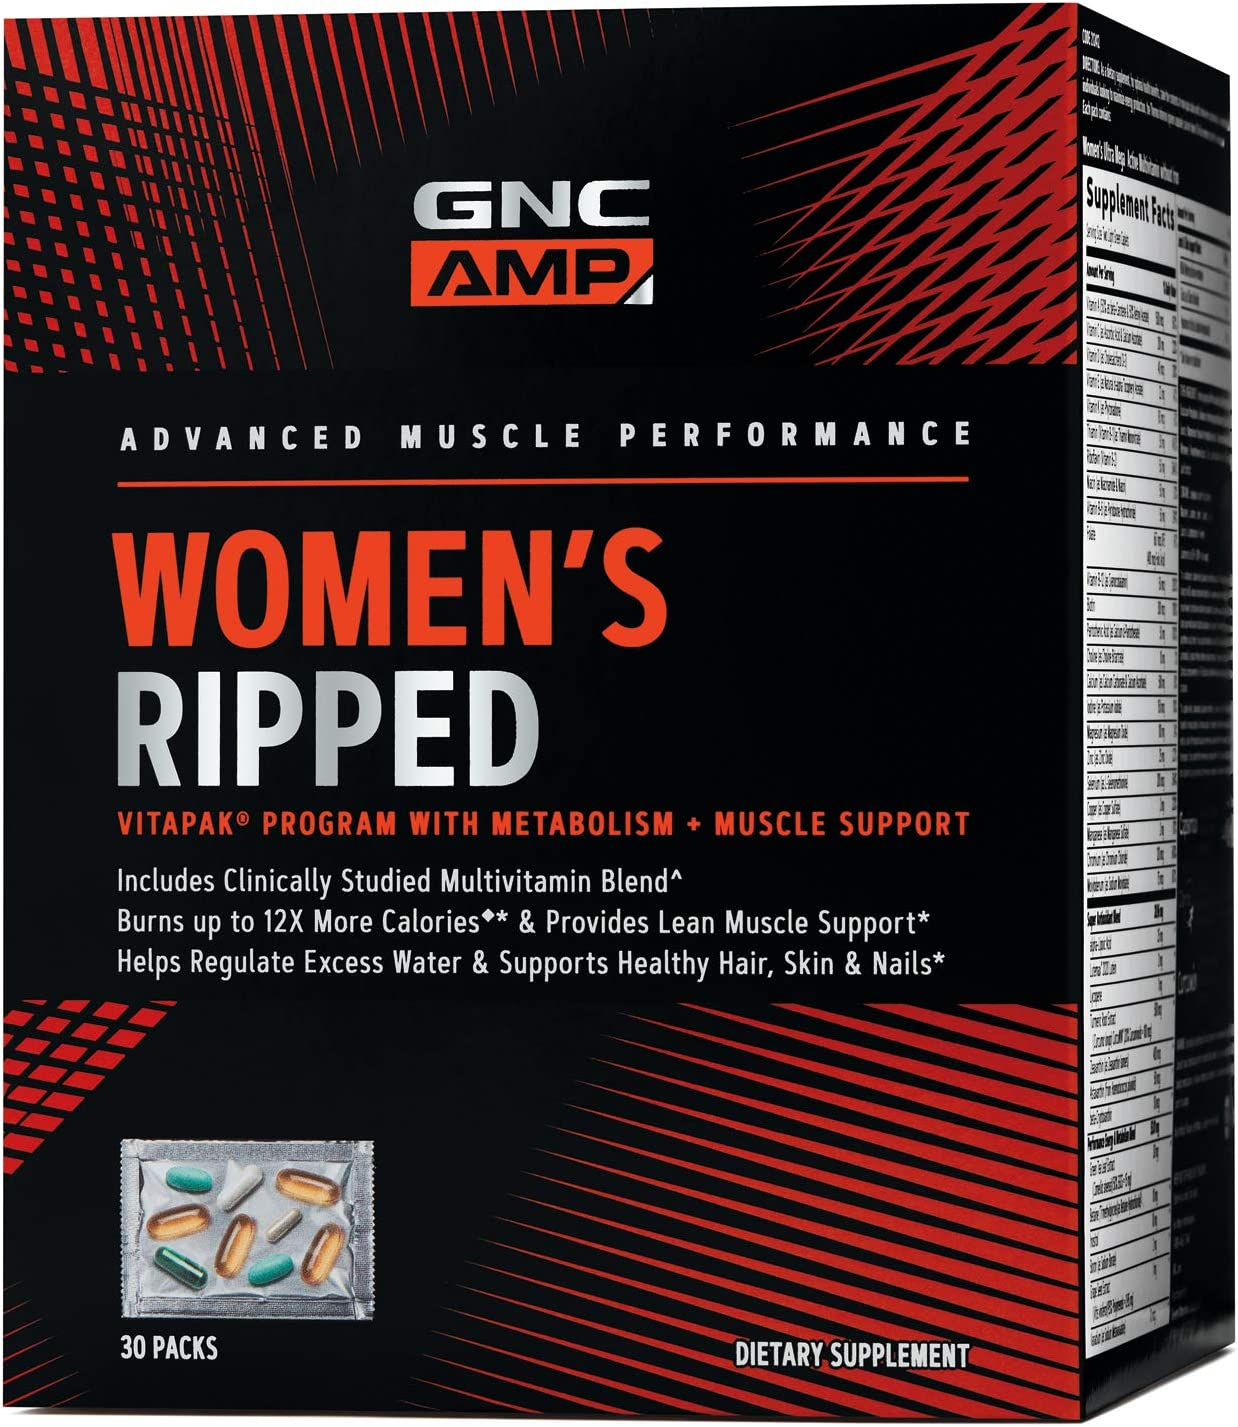 GNC AMP Womens Ripped Vitapak Program